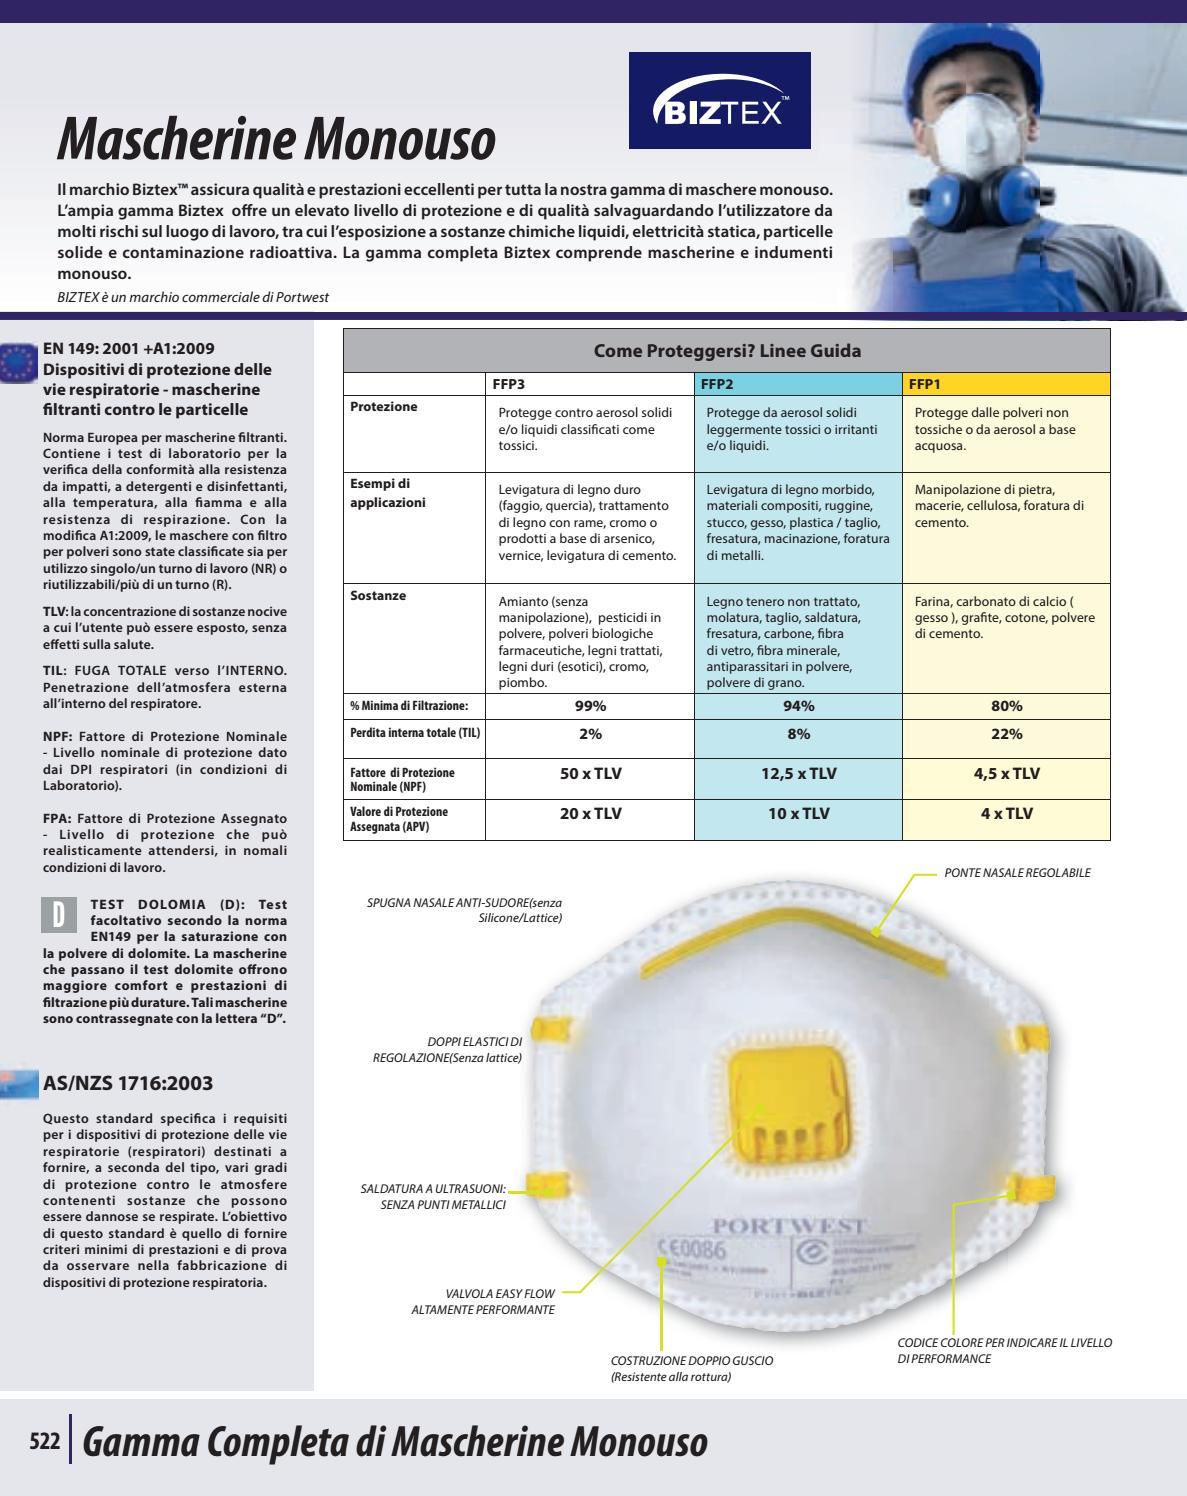 design popolare informazioni per disabilità strutturali Italian online by Portwest Ltd - issuu